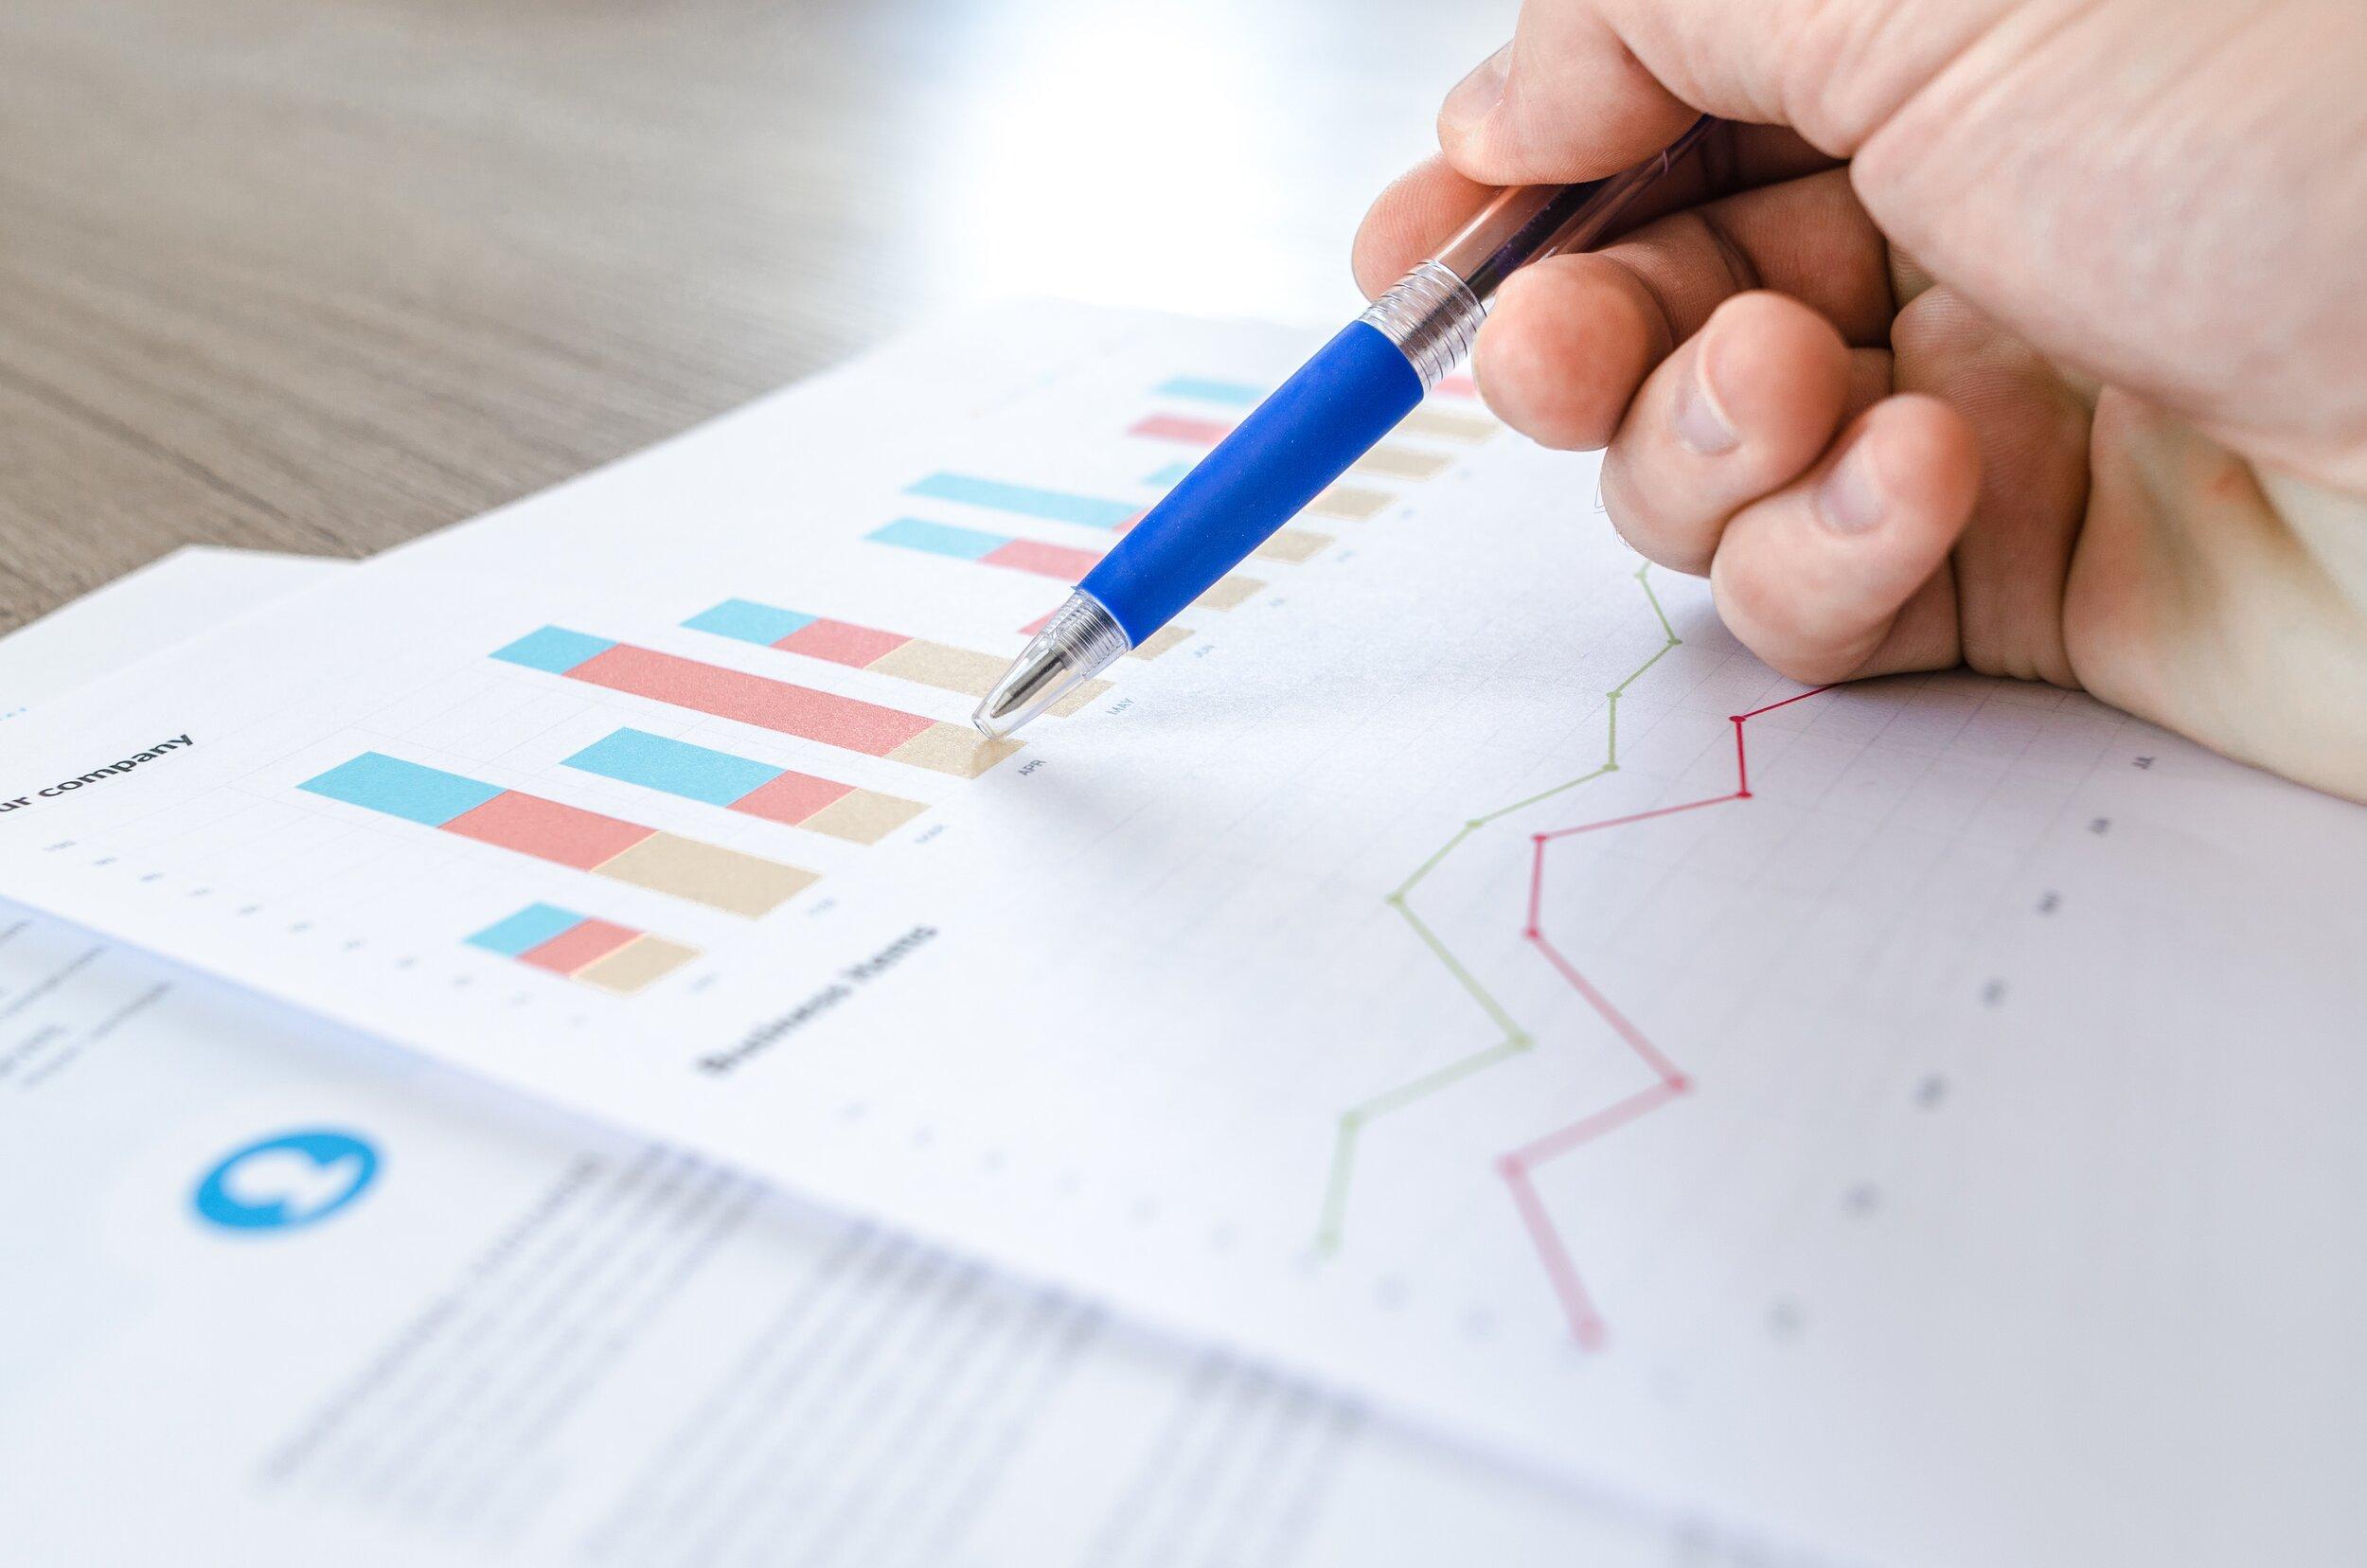 Quality Data translates into Trust -